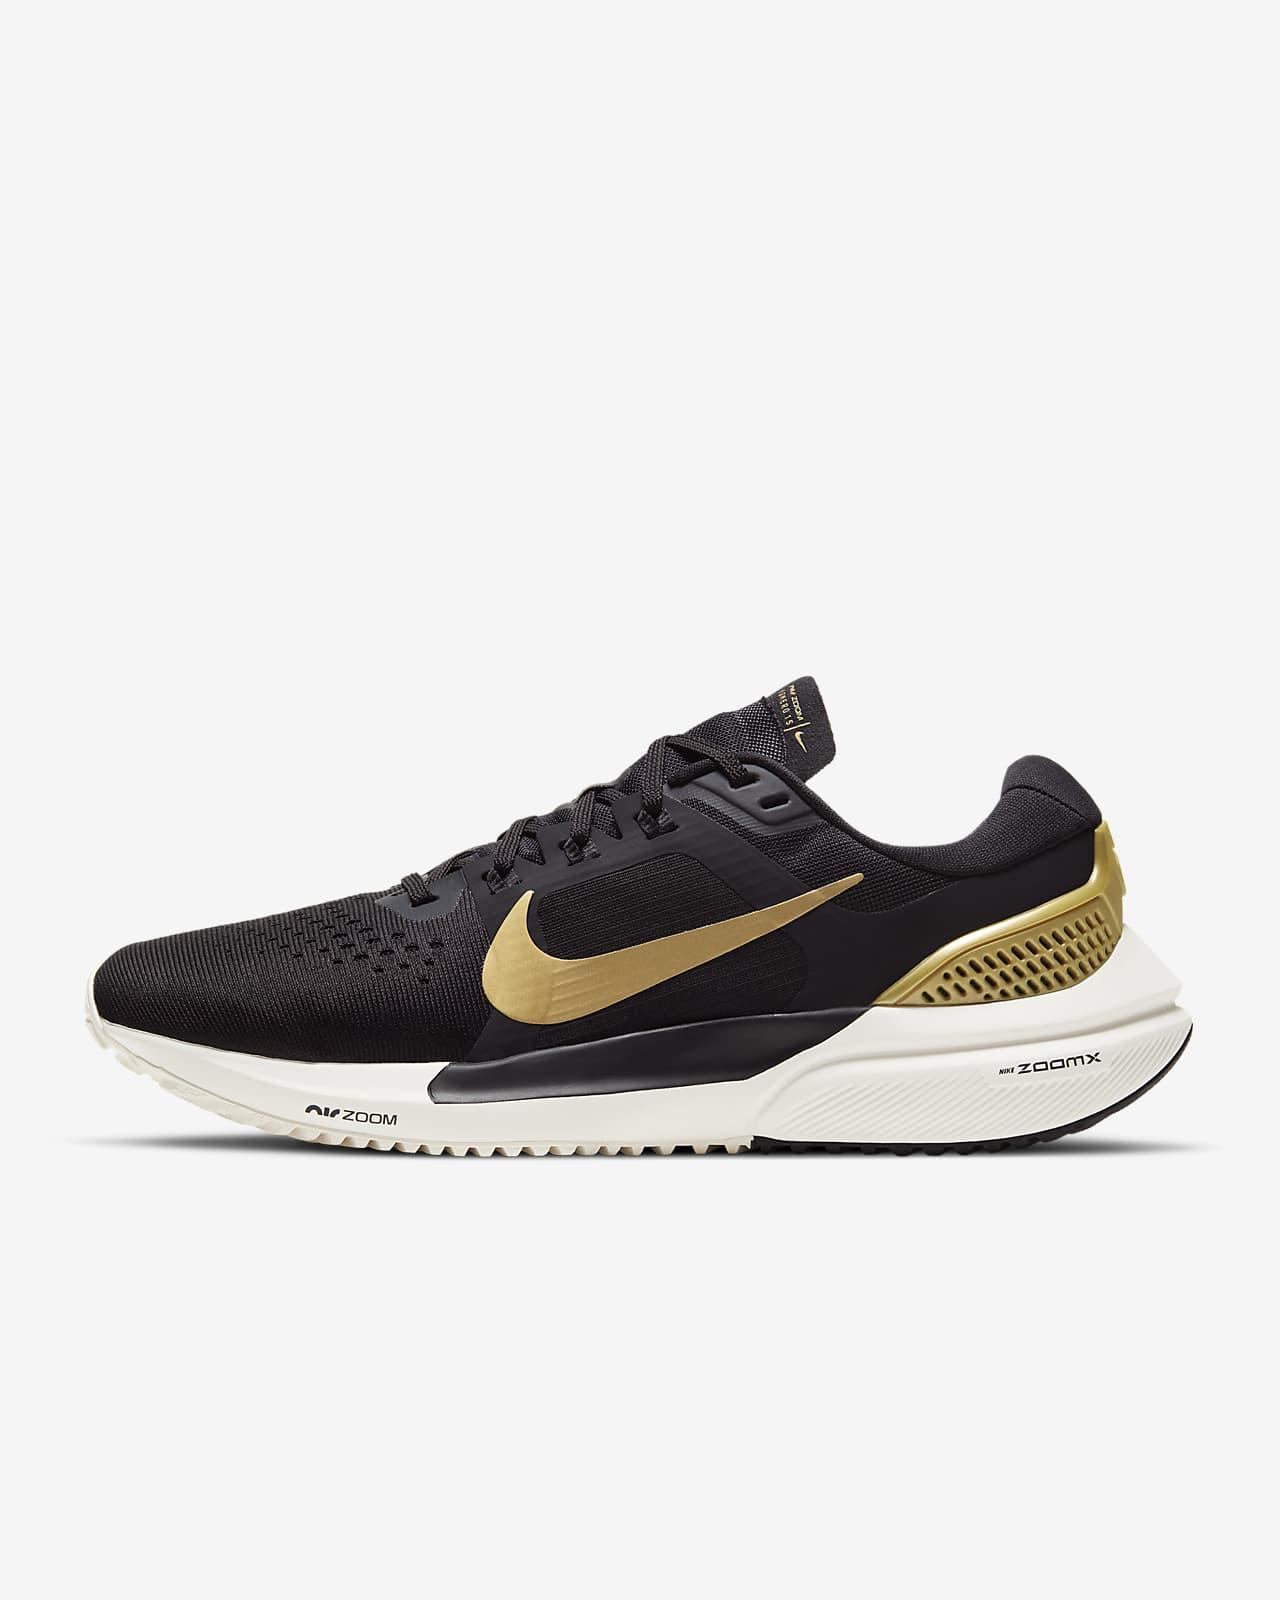 Calzado de running para mujer Nike Air Zoom Vomero 15